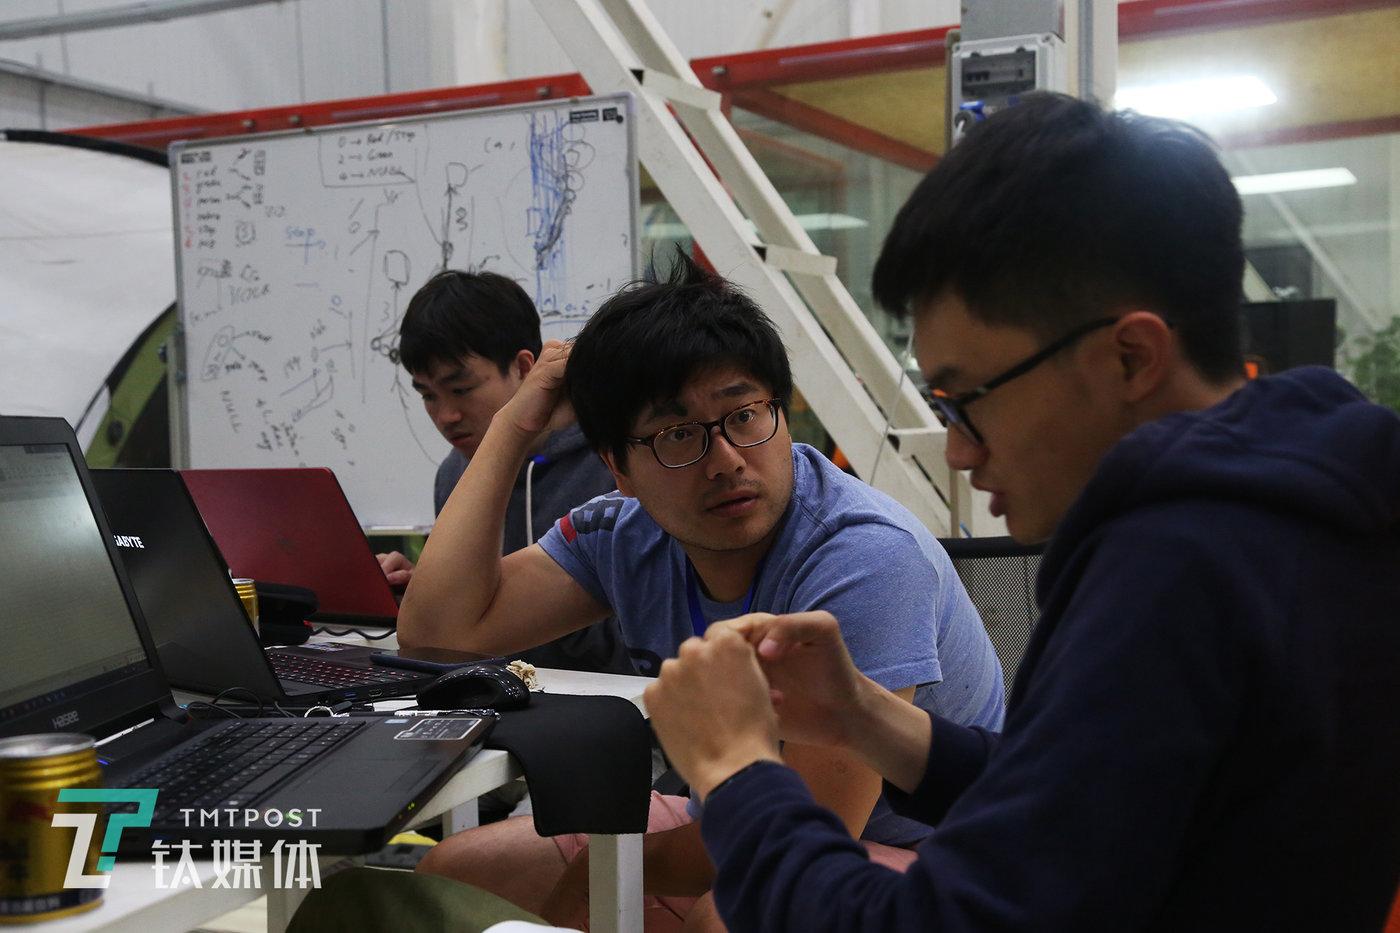 """2 DIFFICULT队""(下文简称D队)队长马臻在和队员讨论赛事方案比赛。D队由上海交通大学汽车工程学院博士后马臻带领的研究生团队、中国移动浙江公司AI算法工程师戚靓亮以及墨西哥深度神经网络学习算法工程师Fernando共6人组成。"